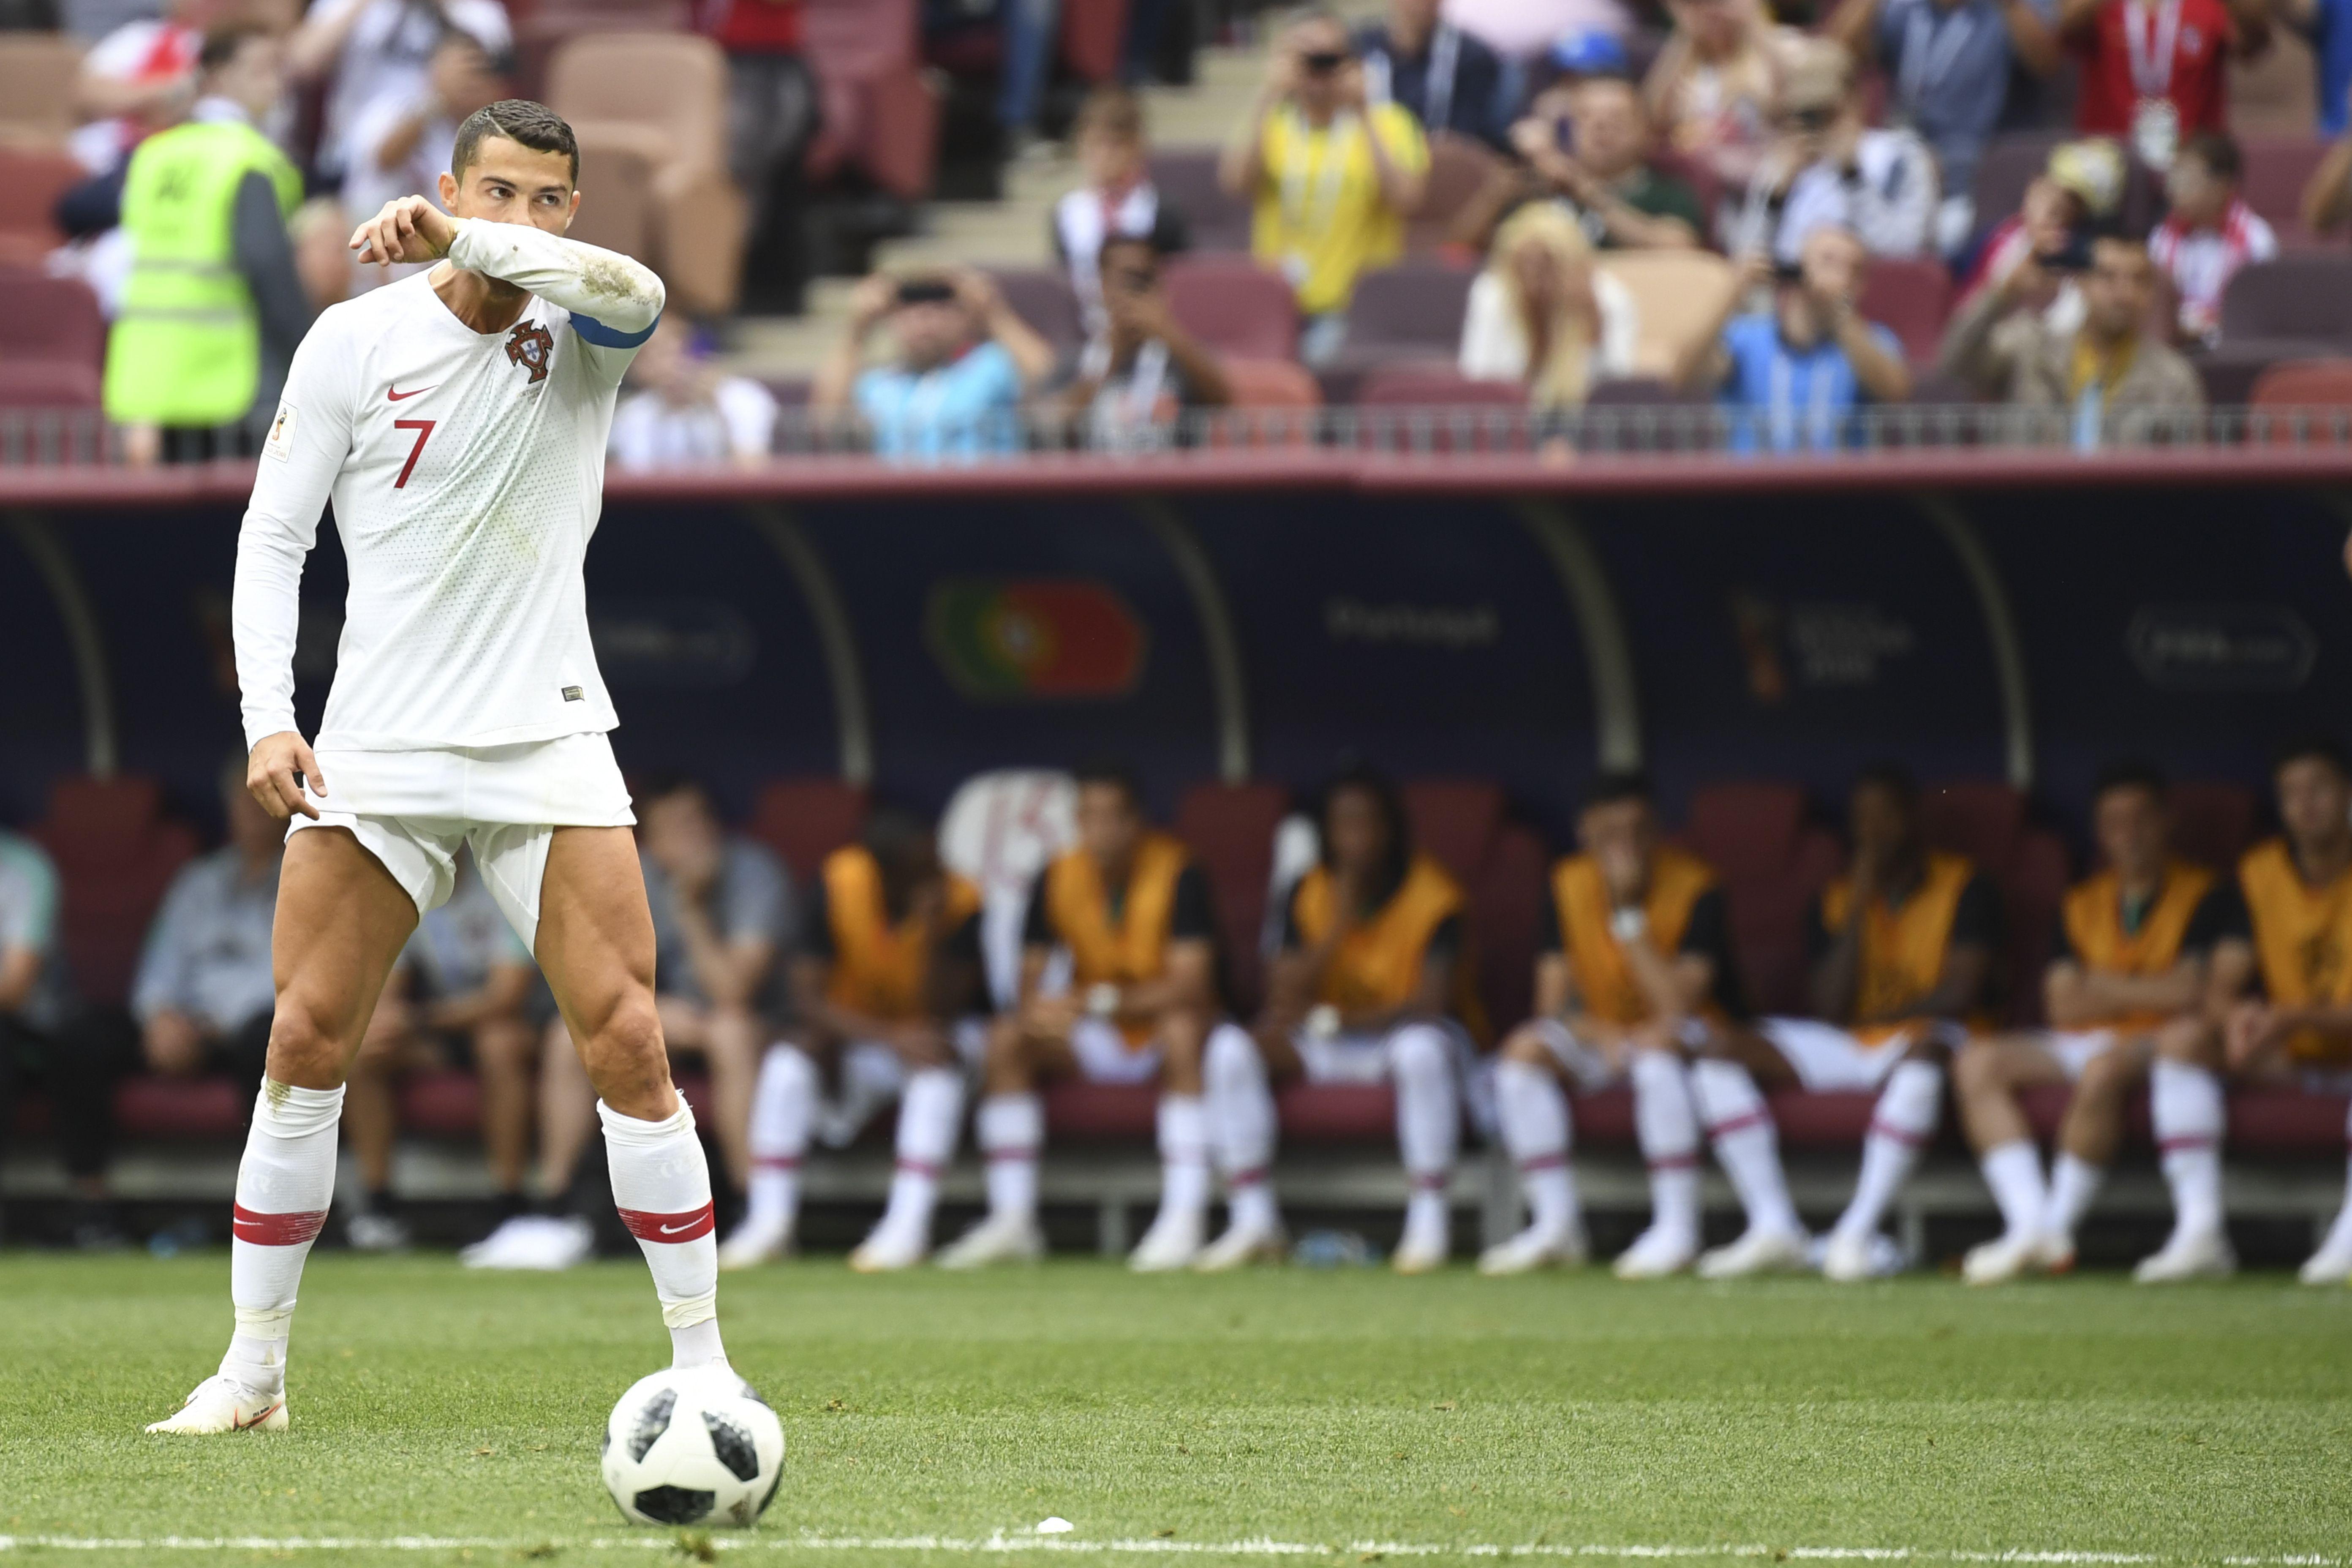 Portugal's forward Cristiano Ronaldo prepares to shoot a free kick.